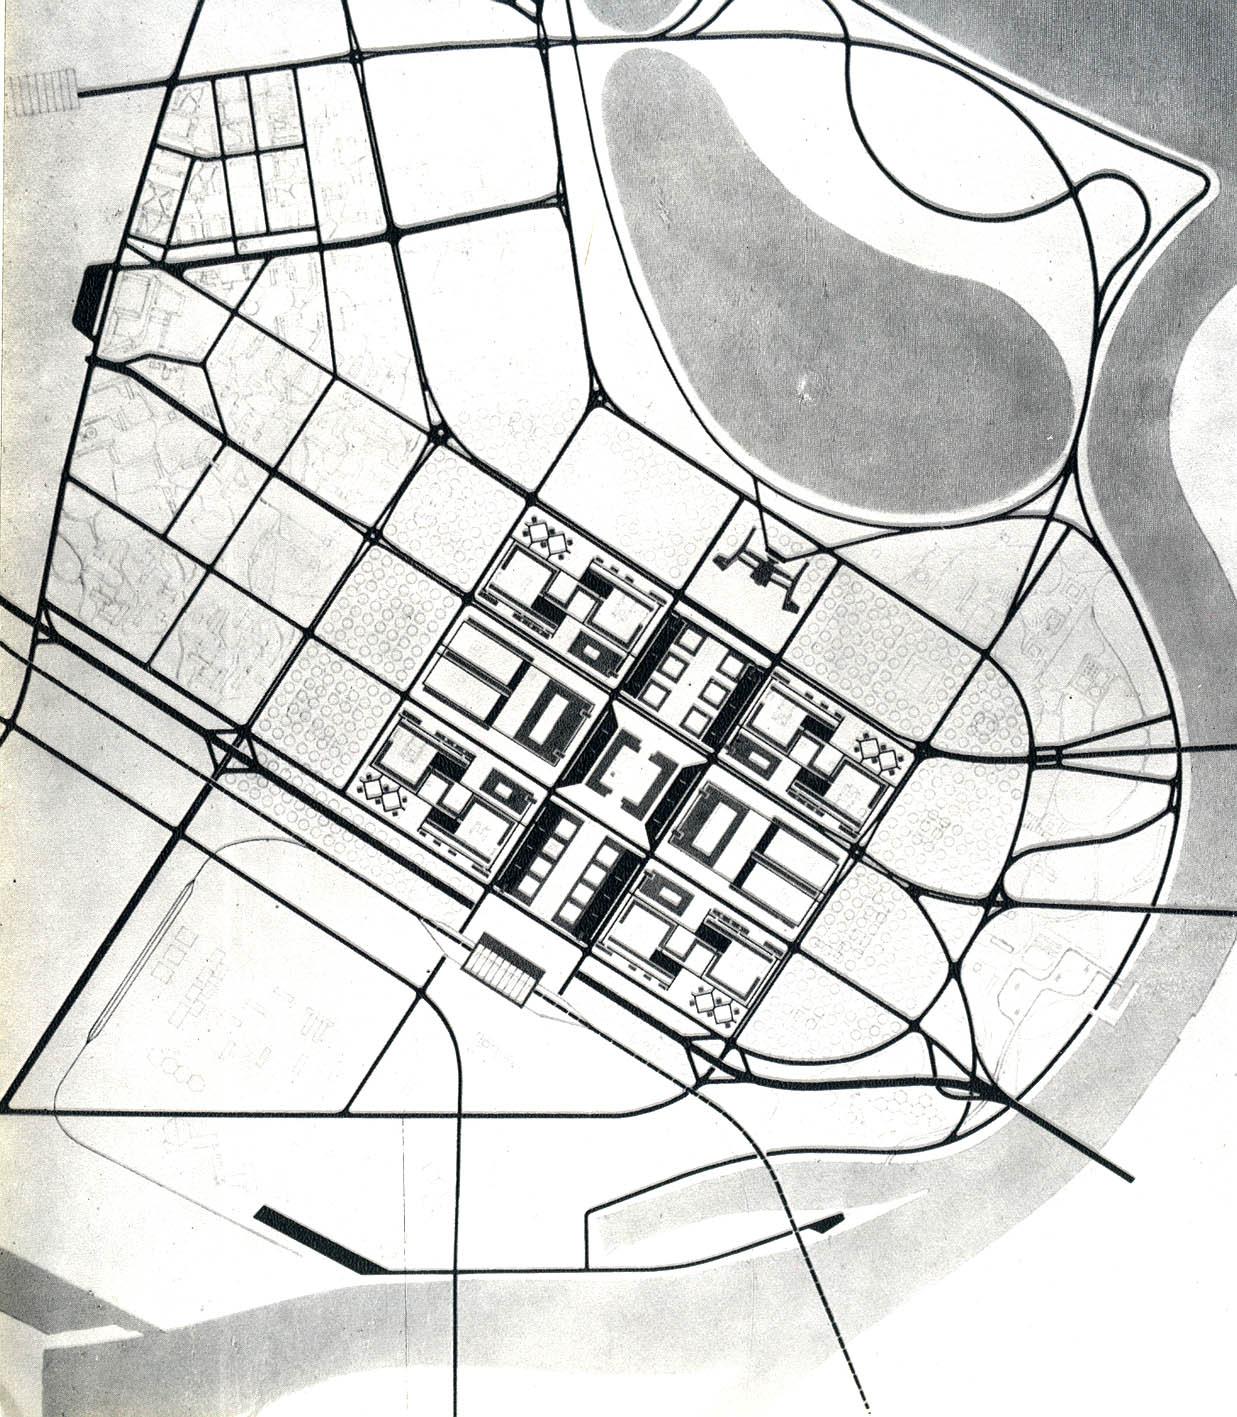 Fig 3: Resulting project of two winning proposals for the New Belgrade centra zone, Institute or Urbanism of Serbia, architects: Aleksandar Djordjević, Leonid Lenarčić, Milutin Glavički, Uroš Martinović, 1959.